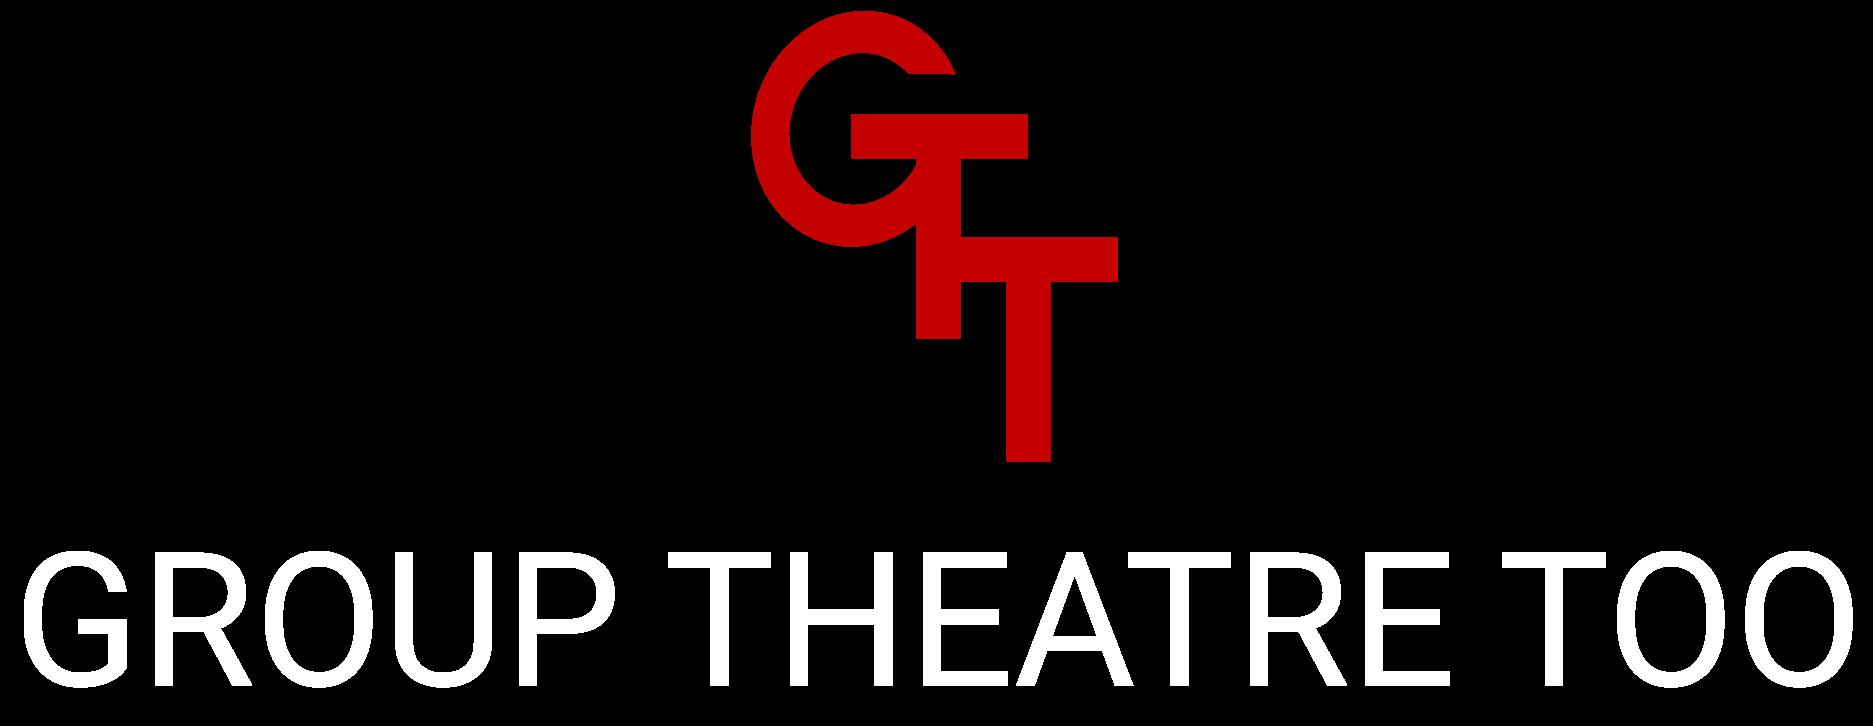 GTT_logo.png